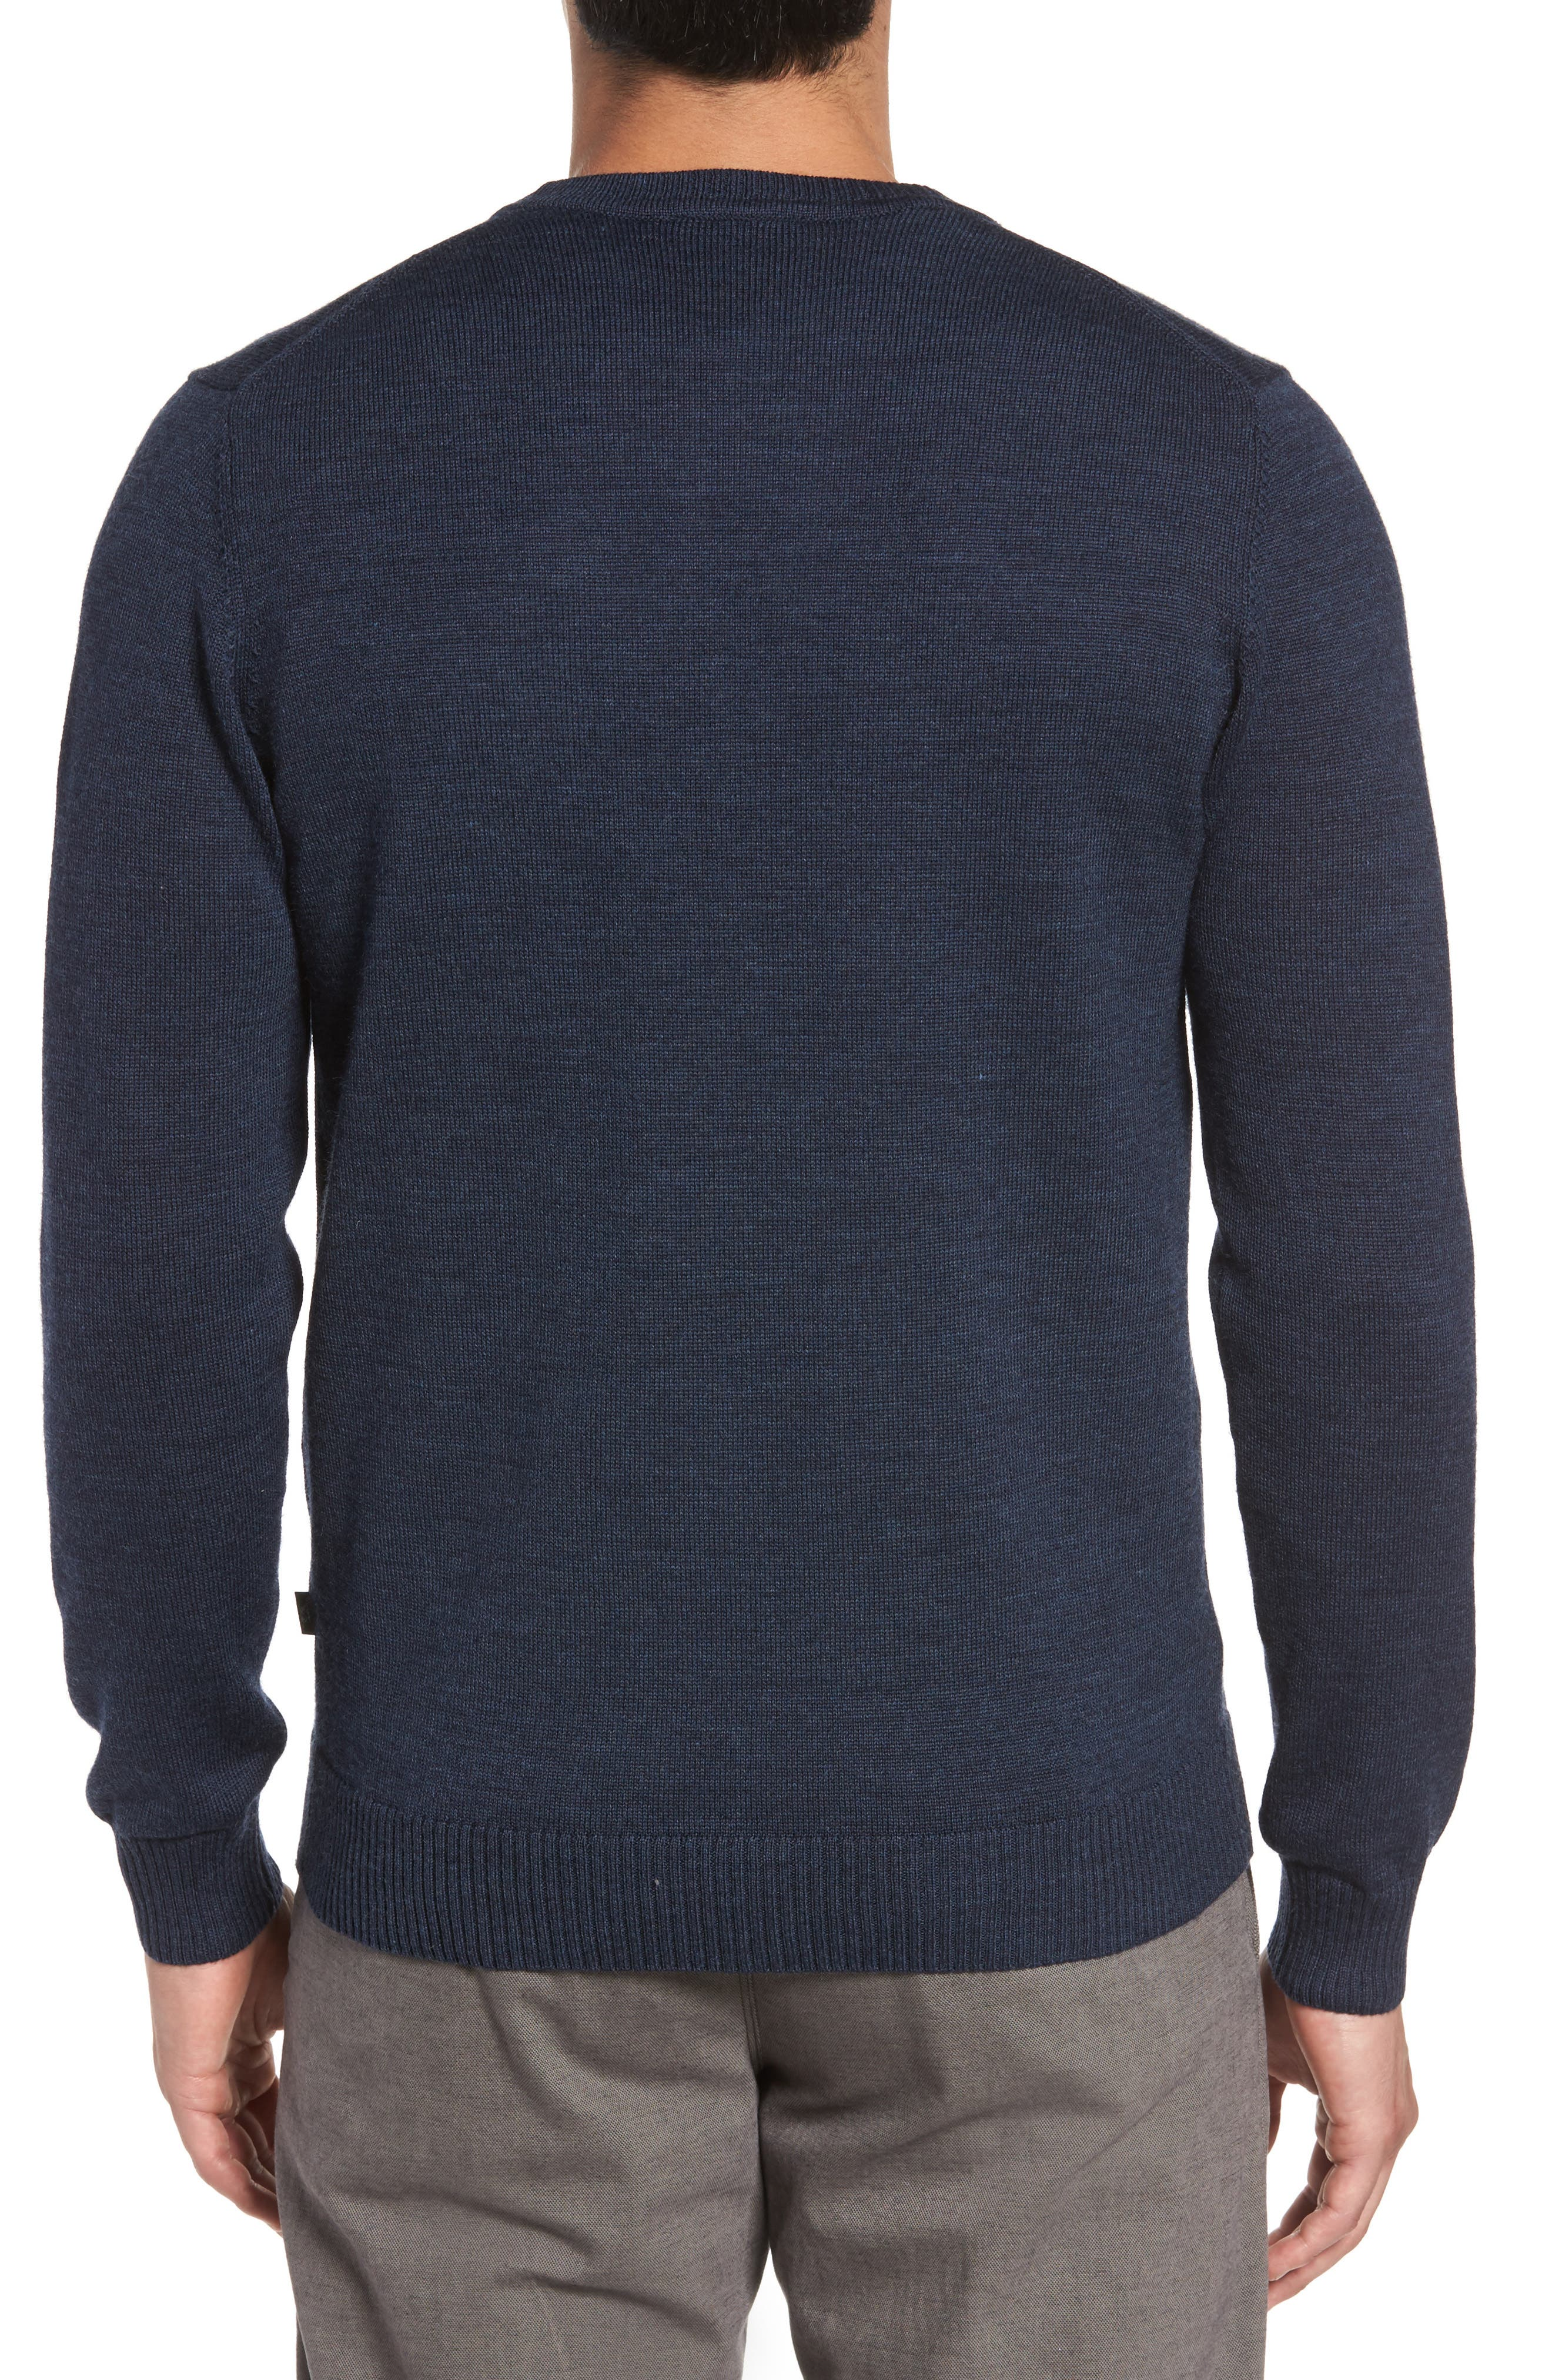 Alternate Image 2  - Rodd & Gunn Bannockburn Mélange Merino Wool Sweater